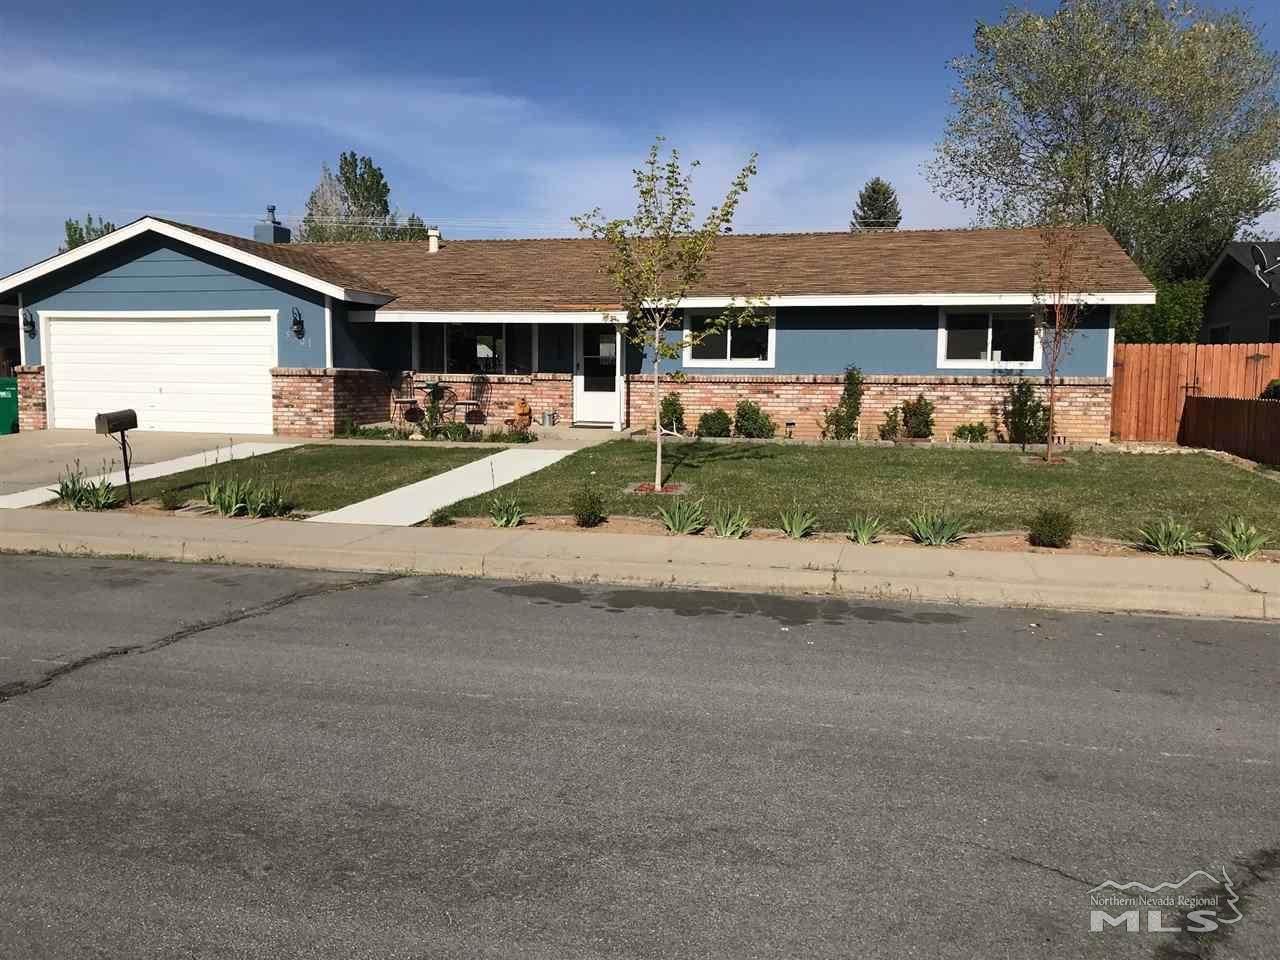 3301 Stafford Way - Photo 1